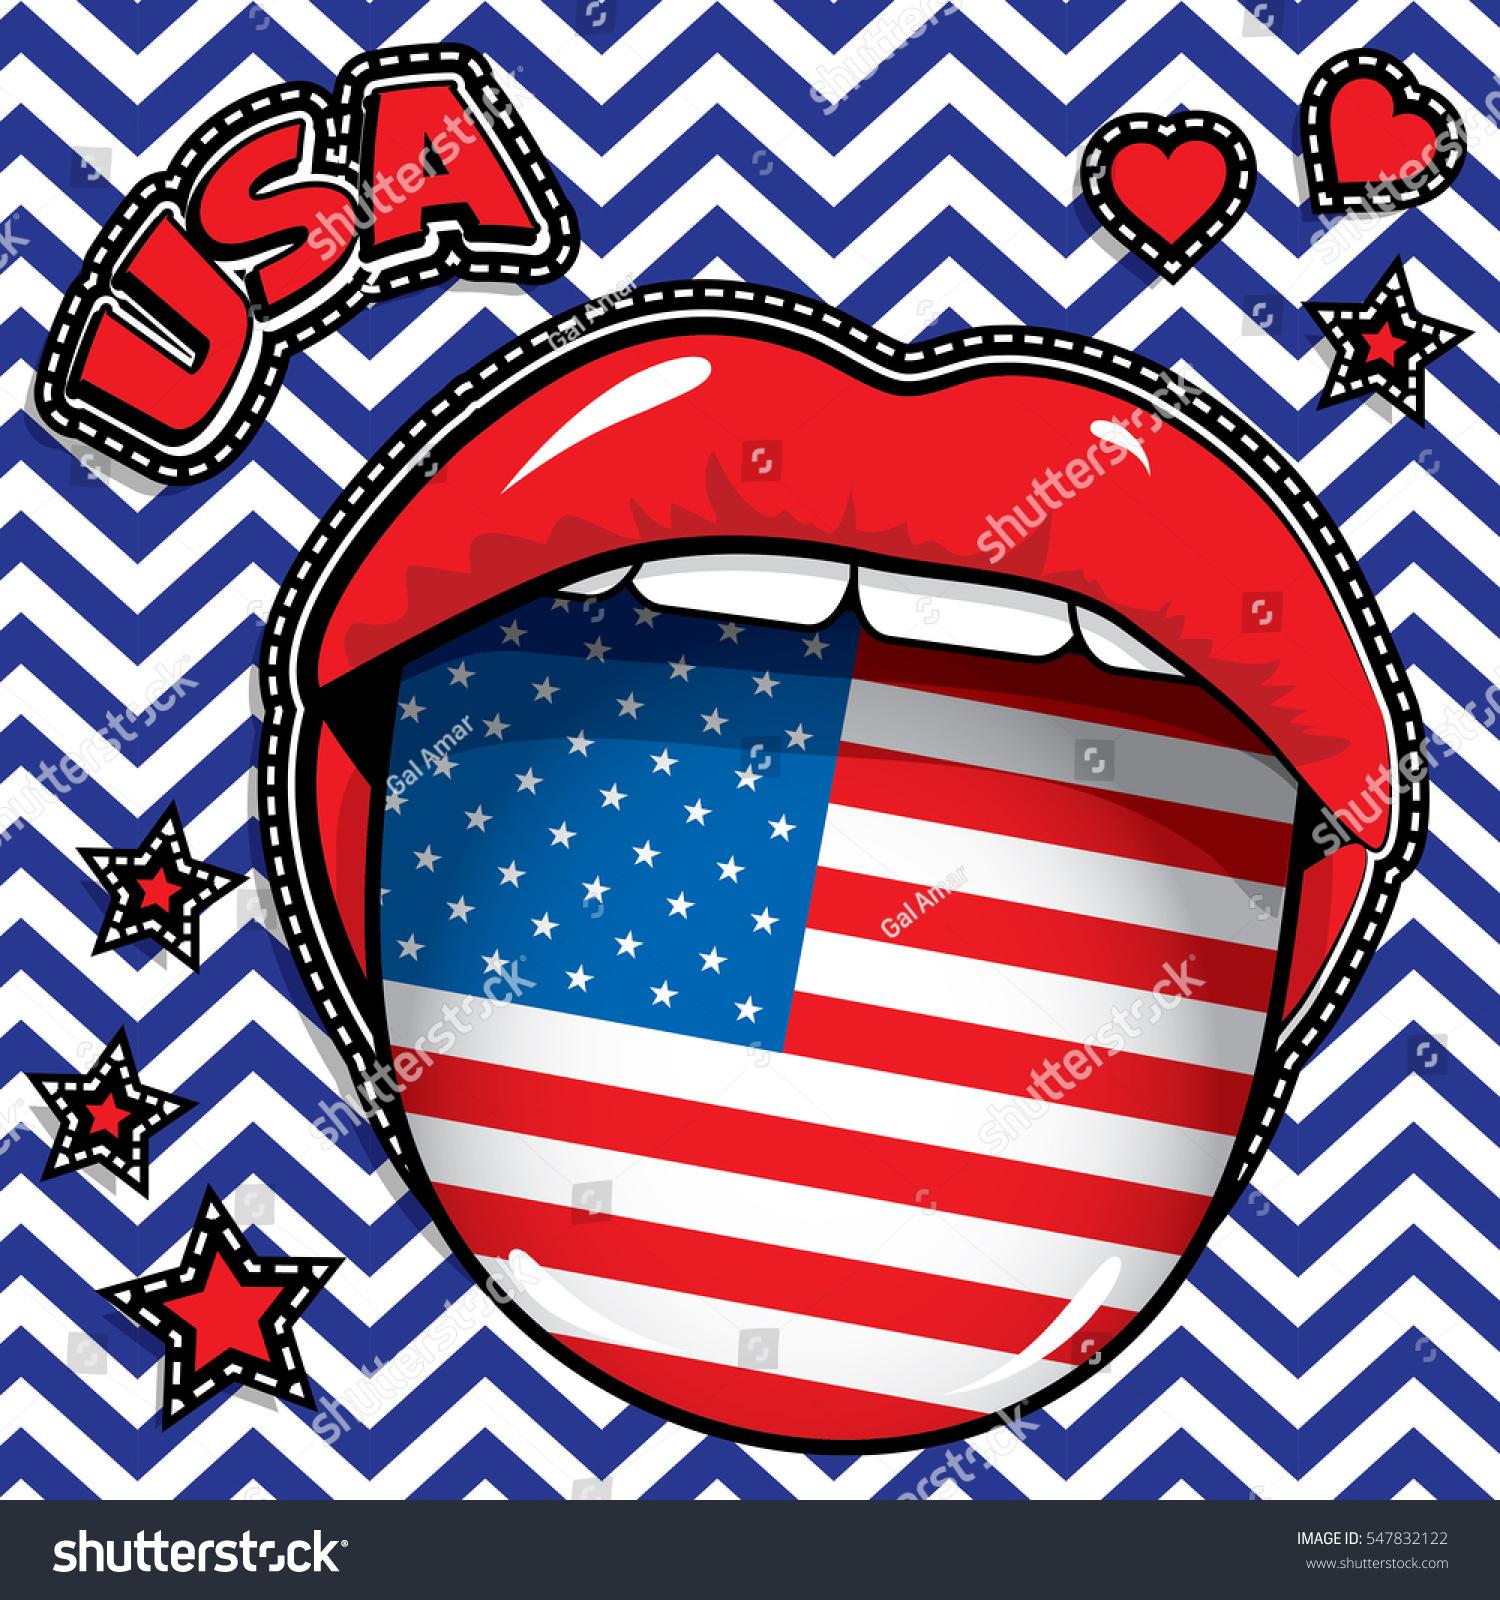 Happy Birthday Usa Pop Art y Stock Vector Shutterstock